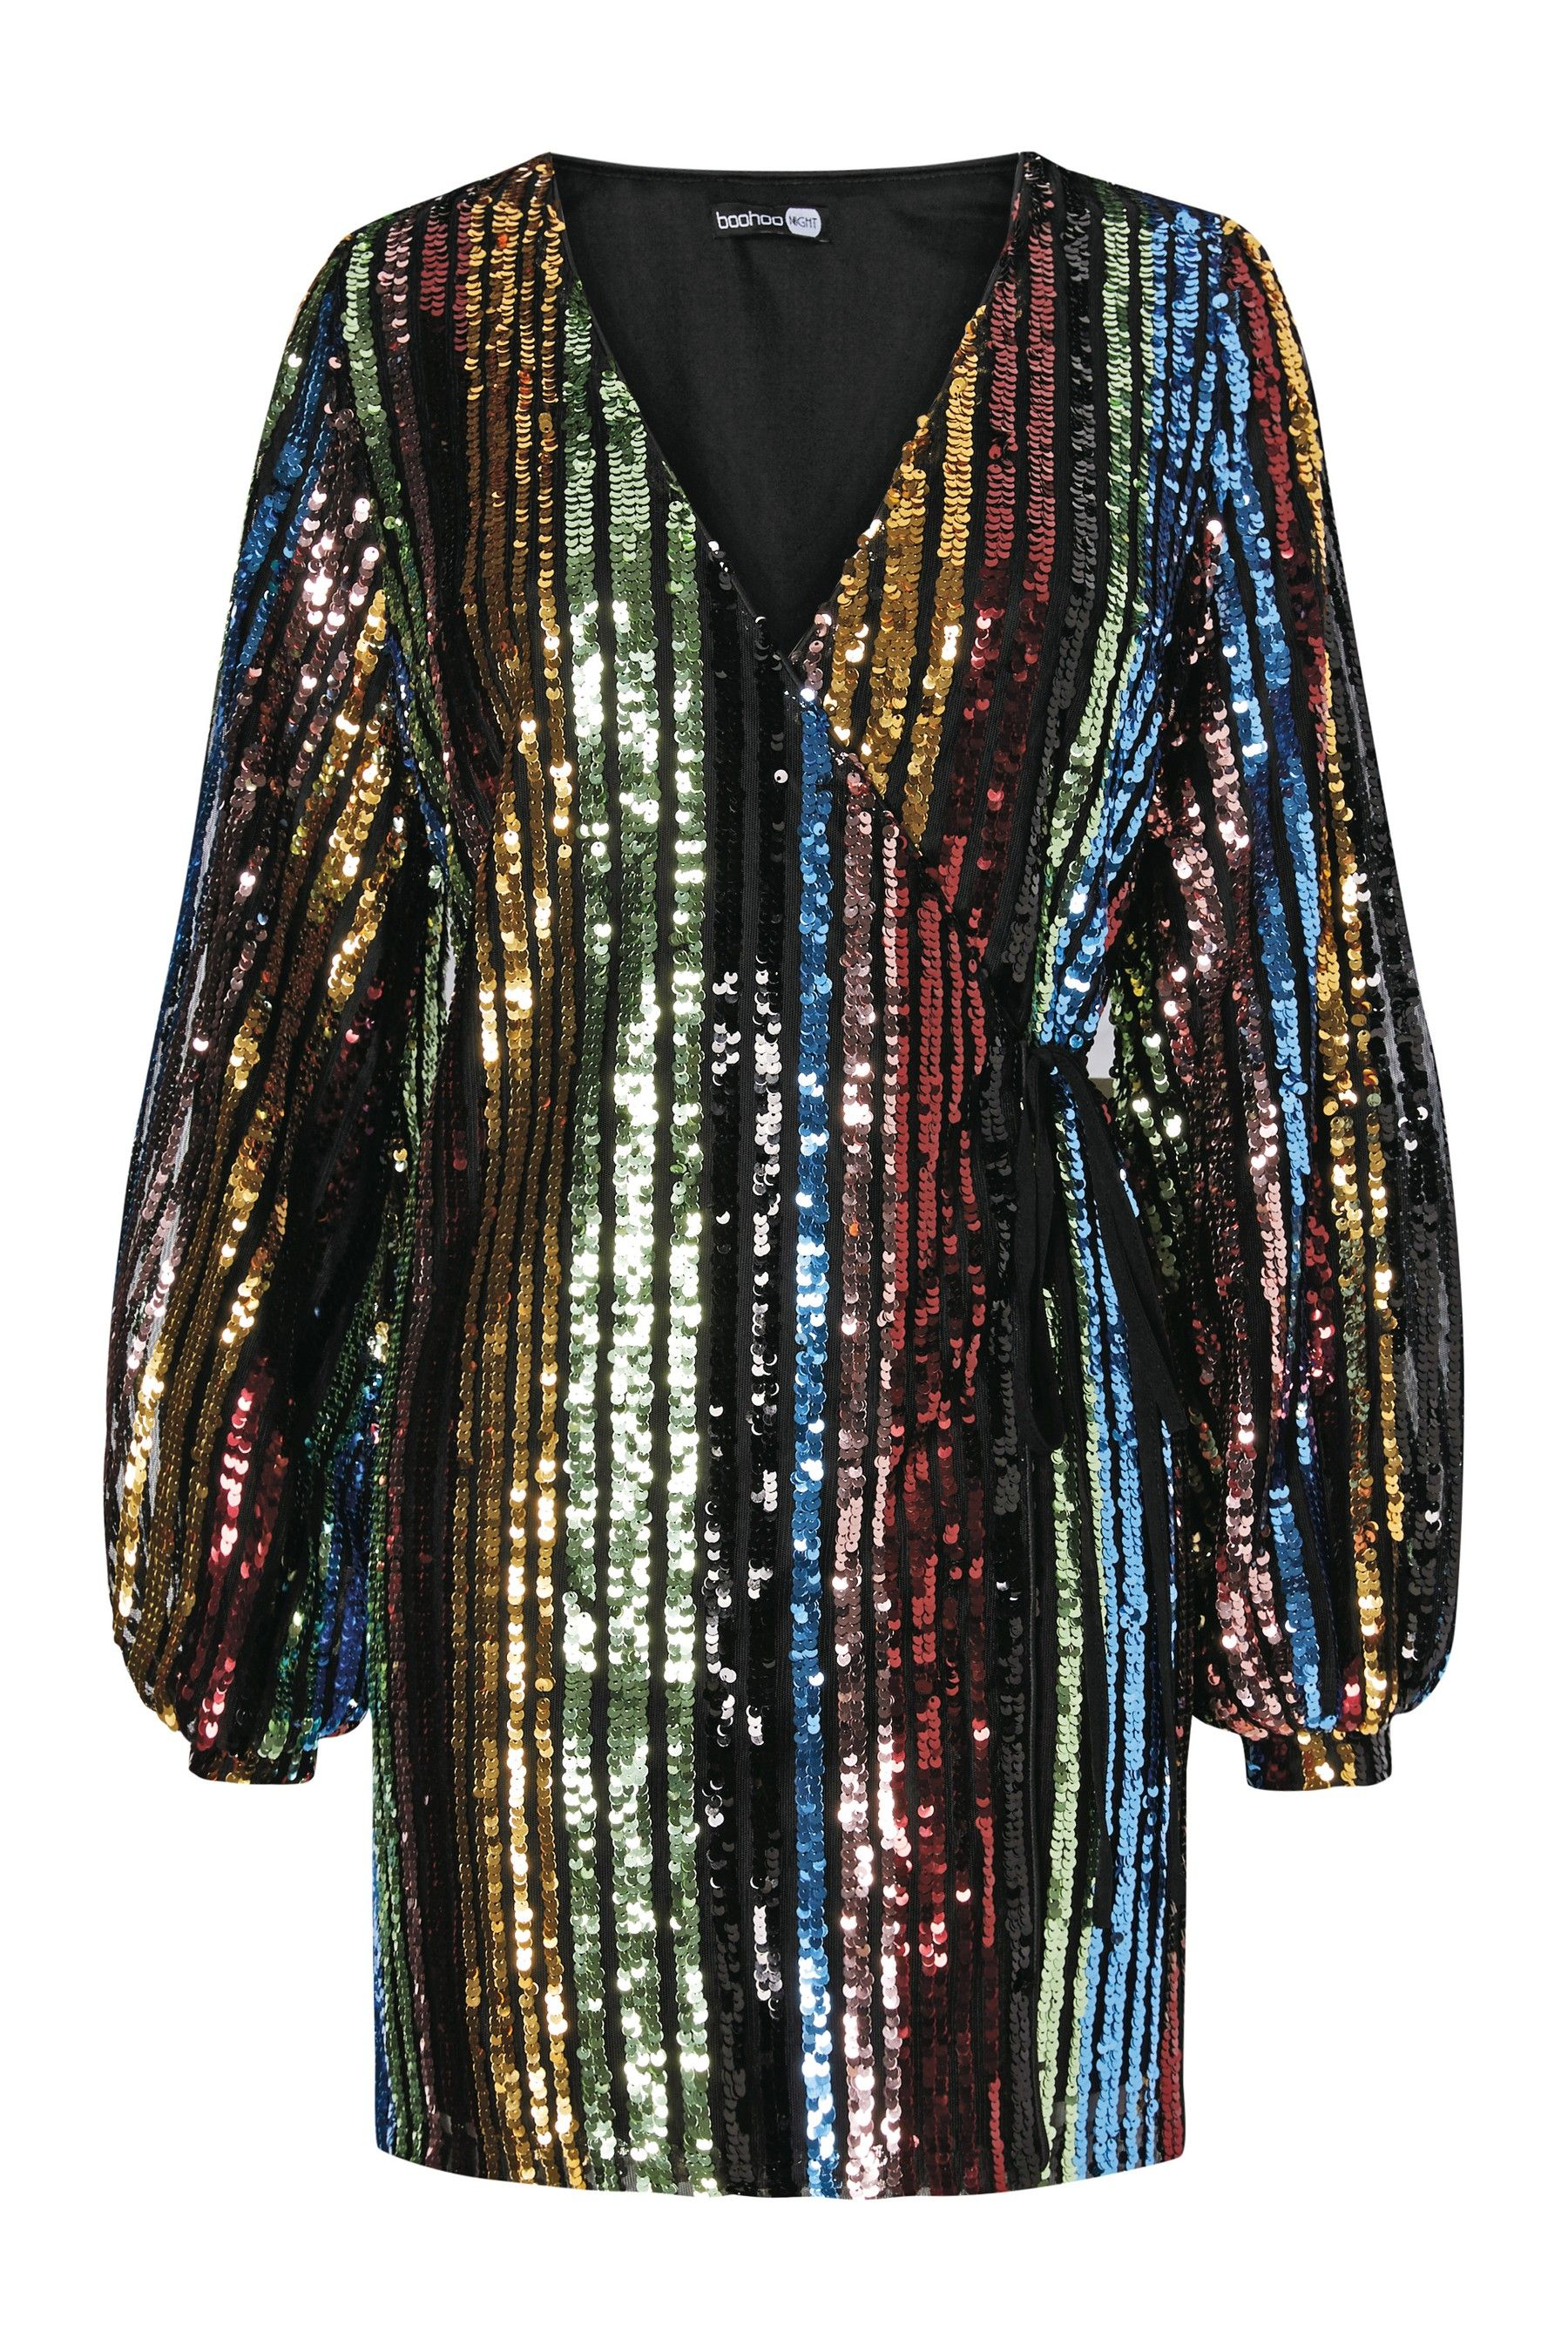 c5fbb60639c6 Womens Boohoo Rainbow Sequin Blouson Sleeve Wrap Dress - Green ...